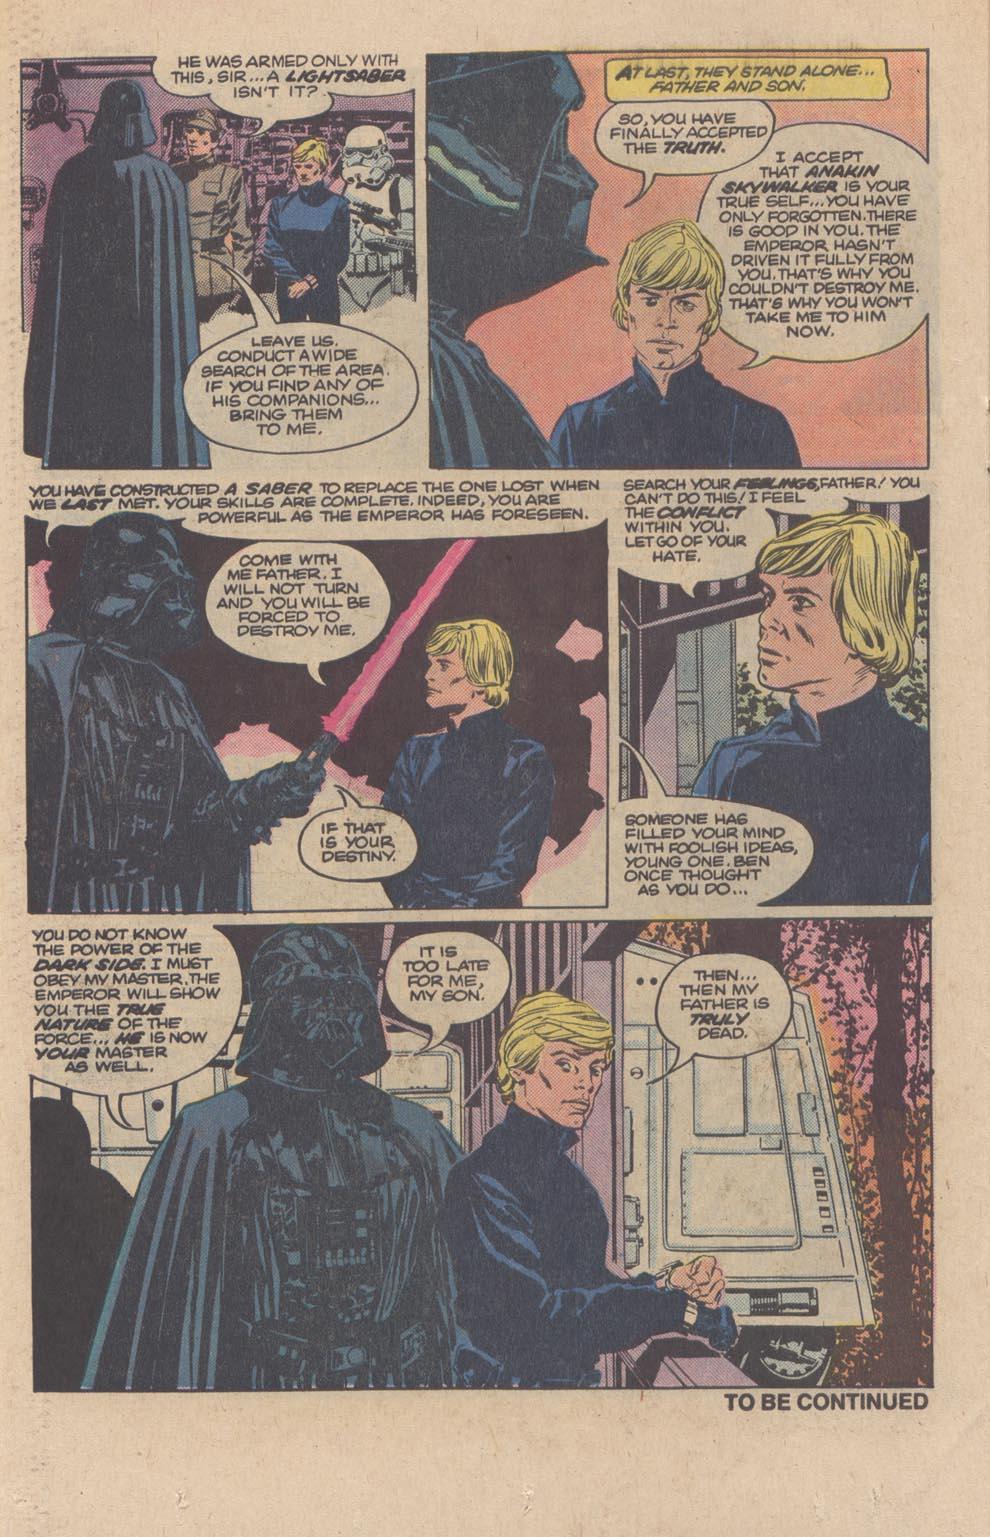 Read online Star Wars: Return of the Jedi comic -  Issue #3 - 20